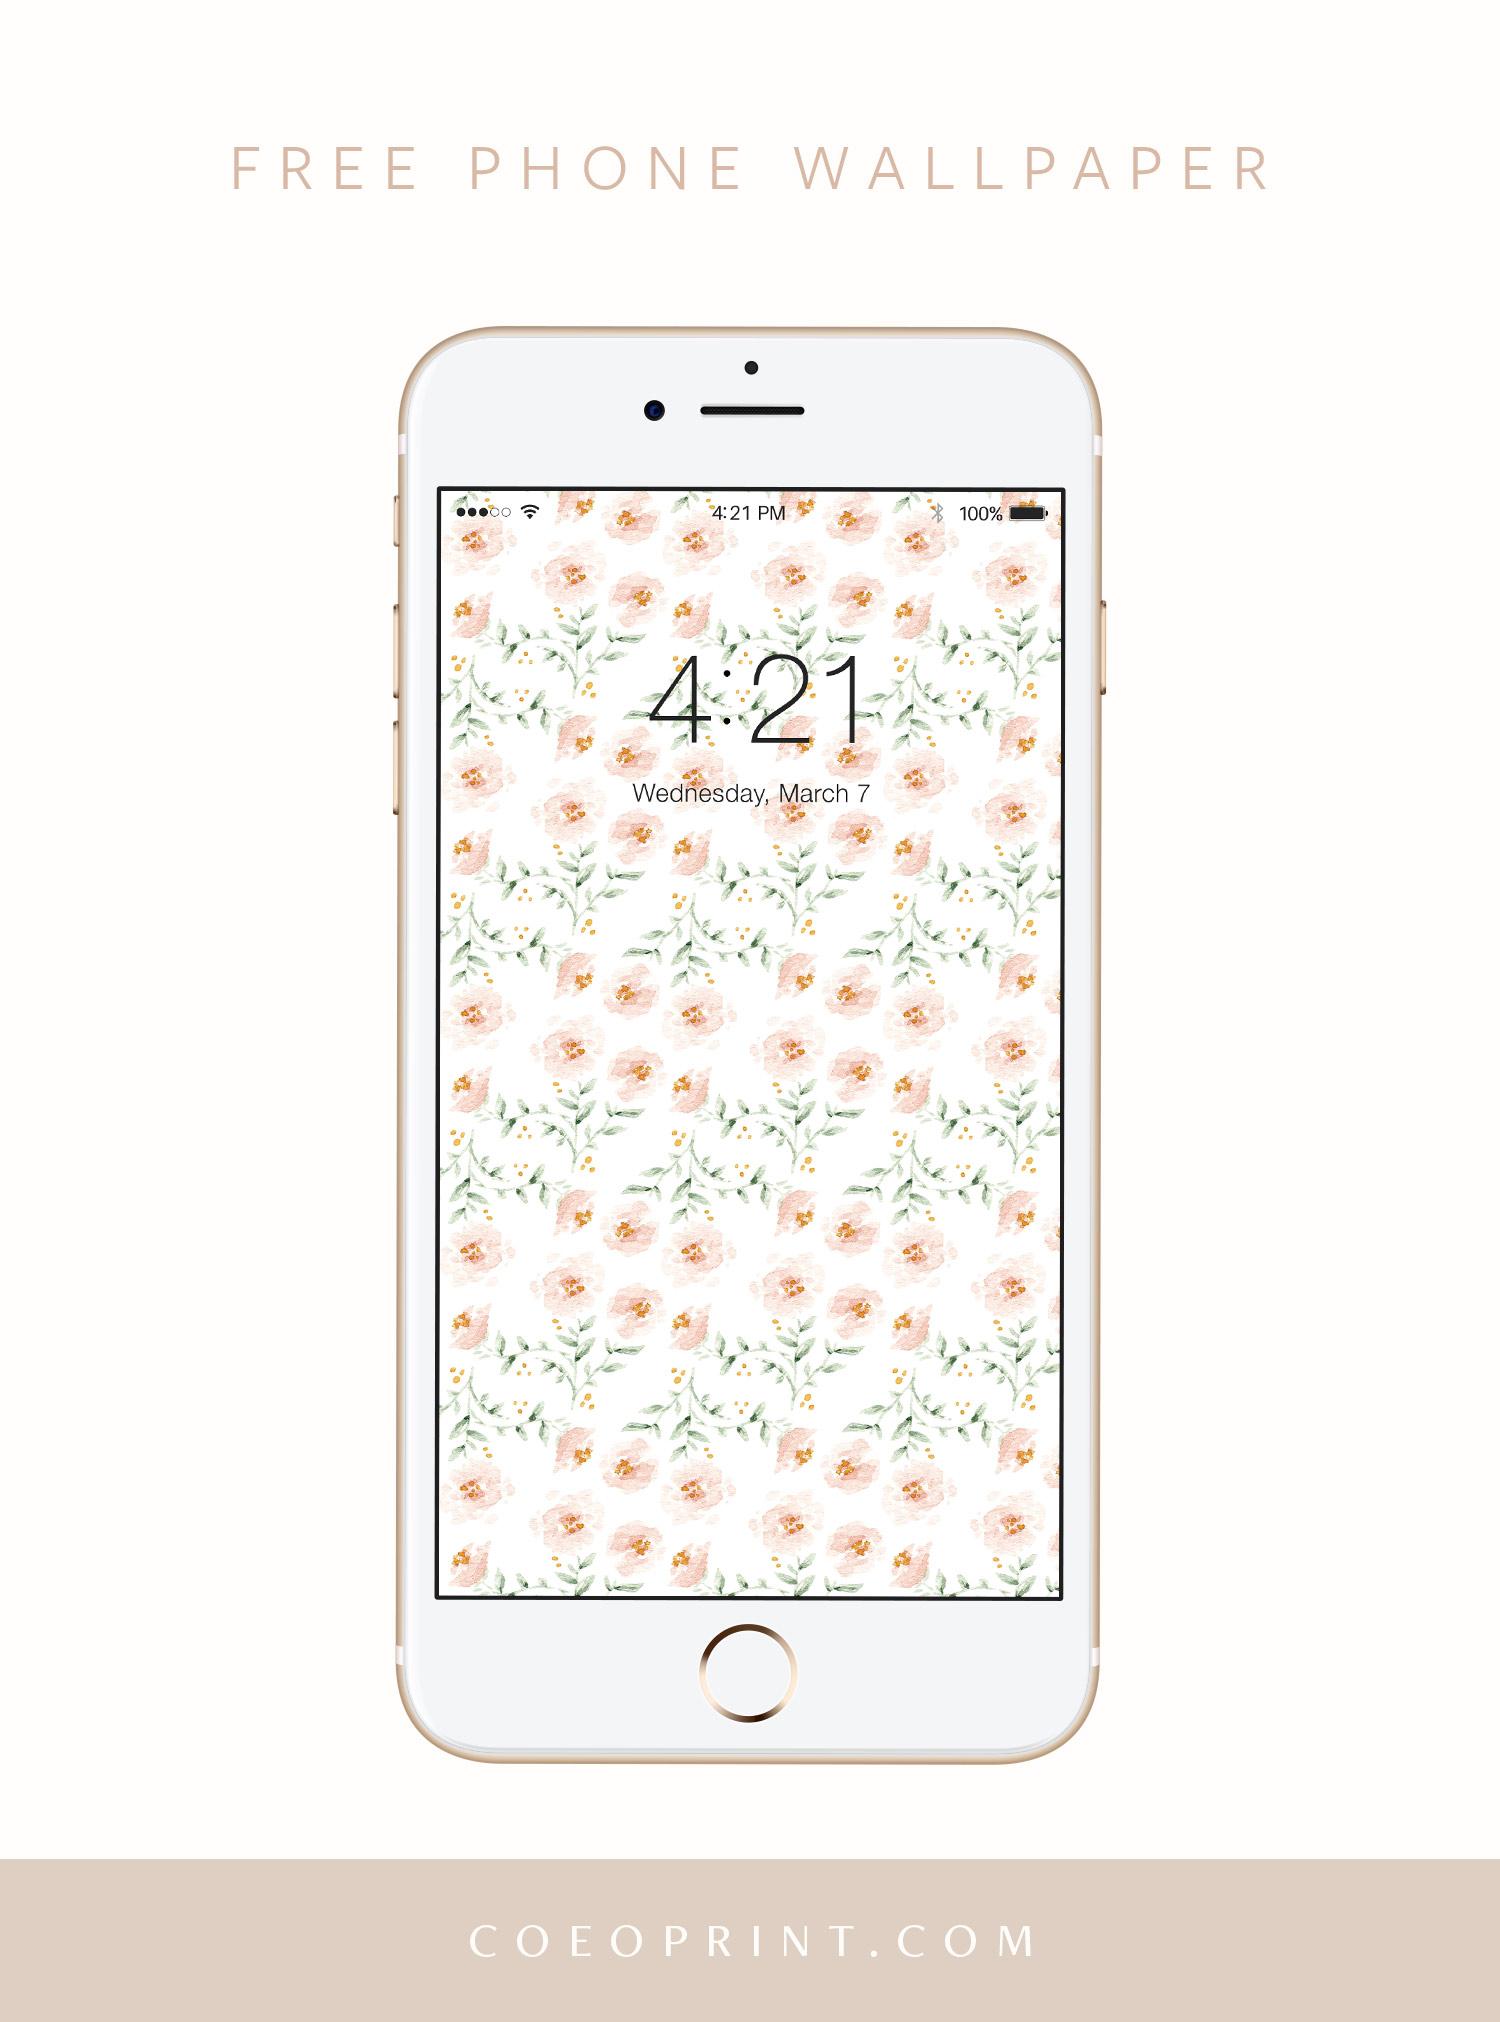 free-phone-wallpaper-download-watercolor-floral-pattern-2.jpg